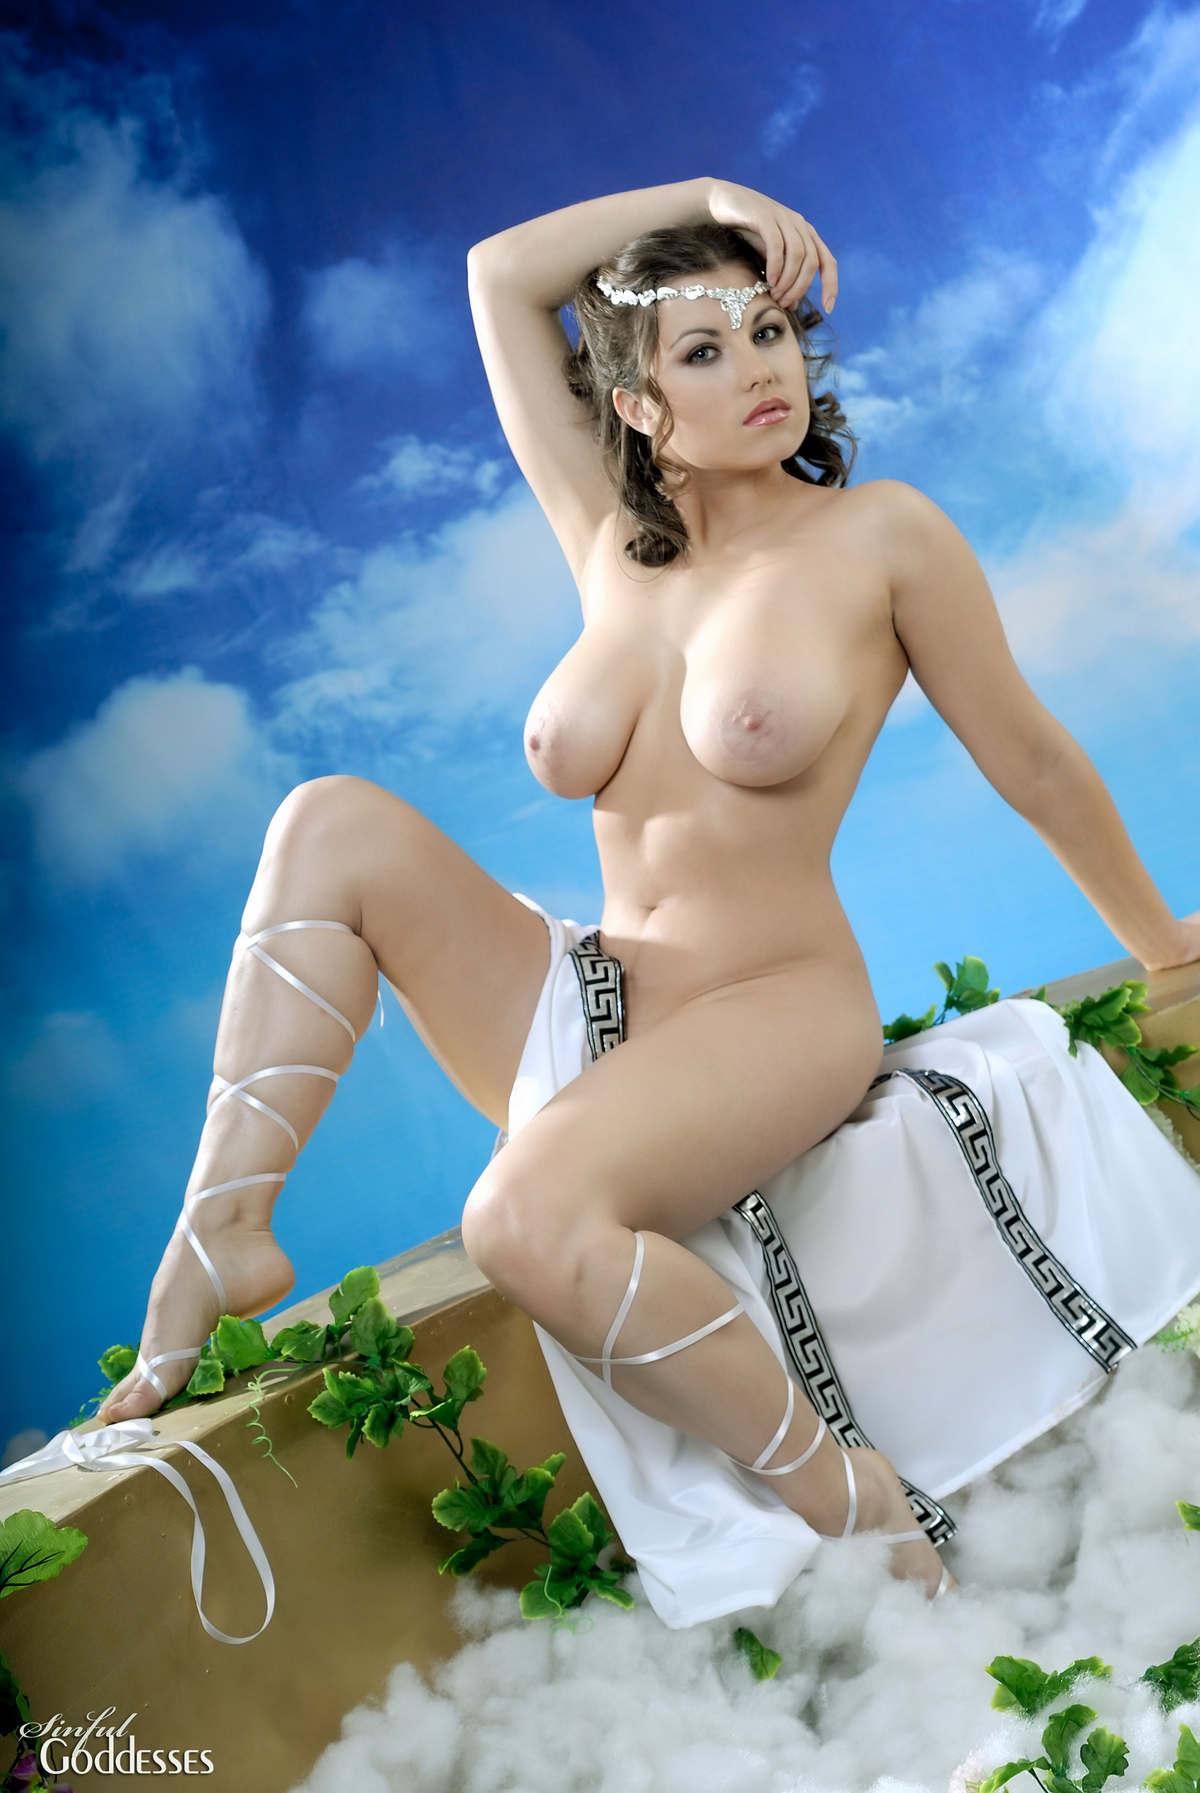 What? Girl nude greek goddess costume